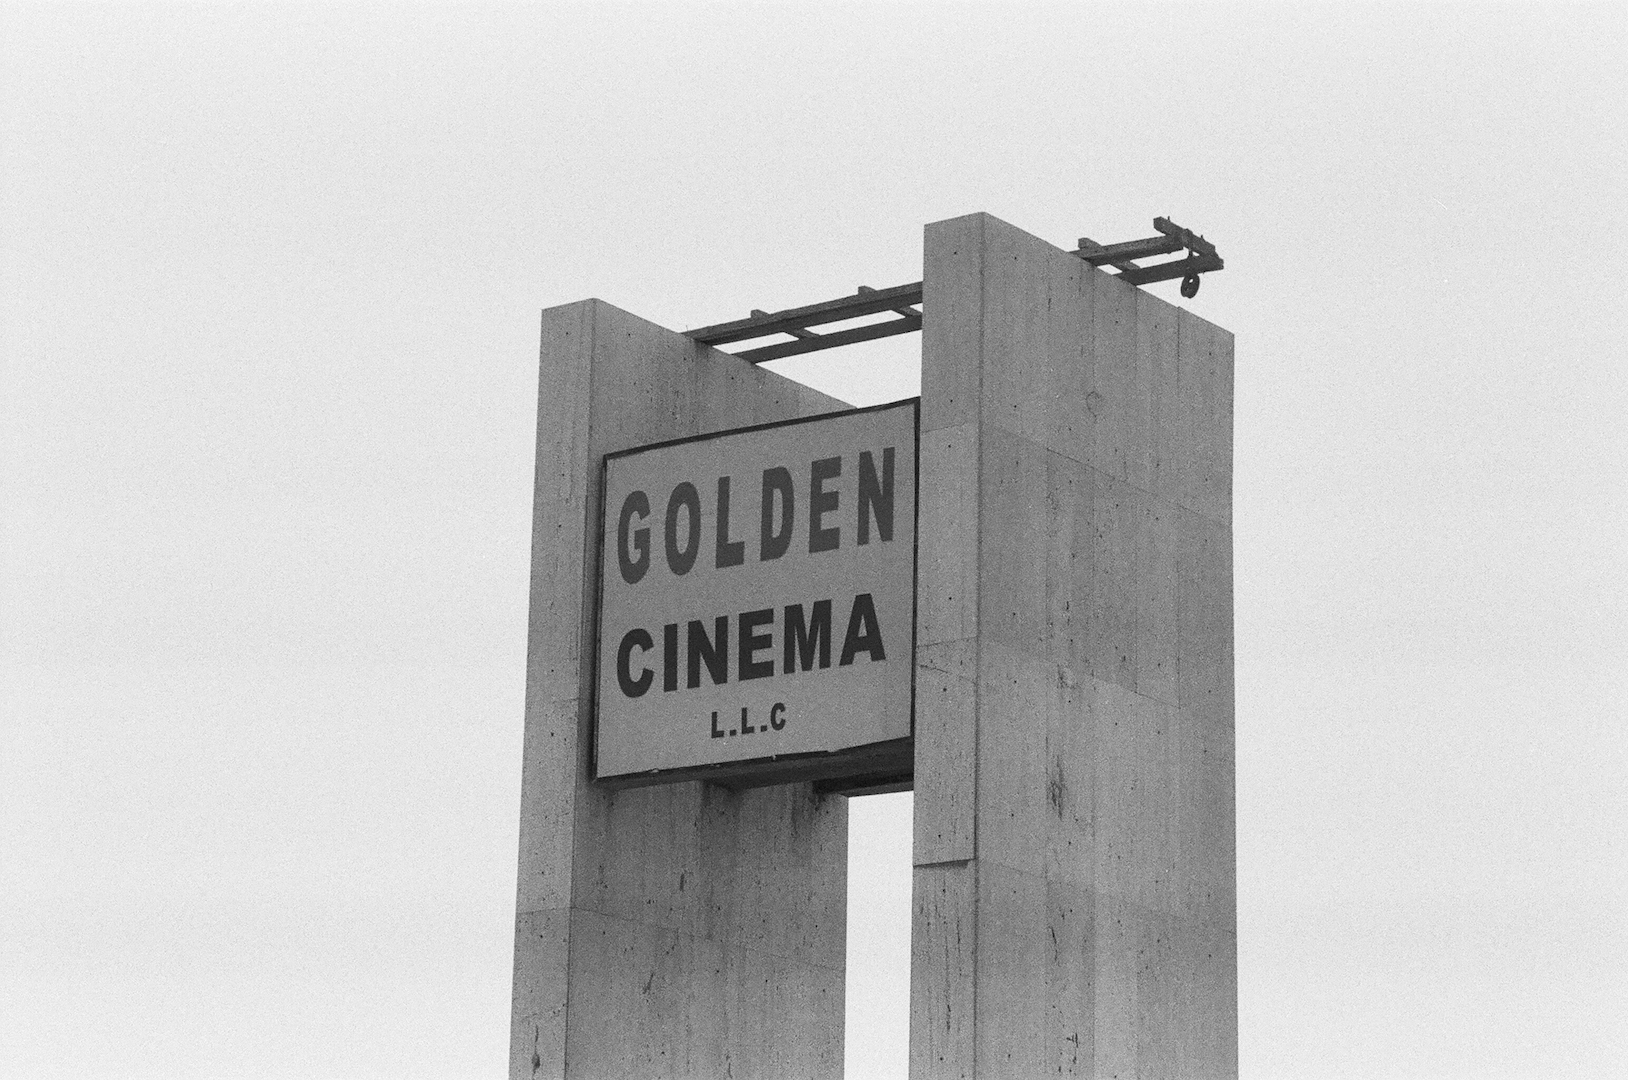 kerning-cultures-golden-cinema-12.jpg